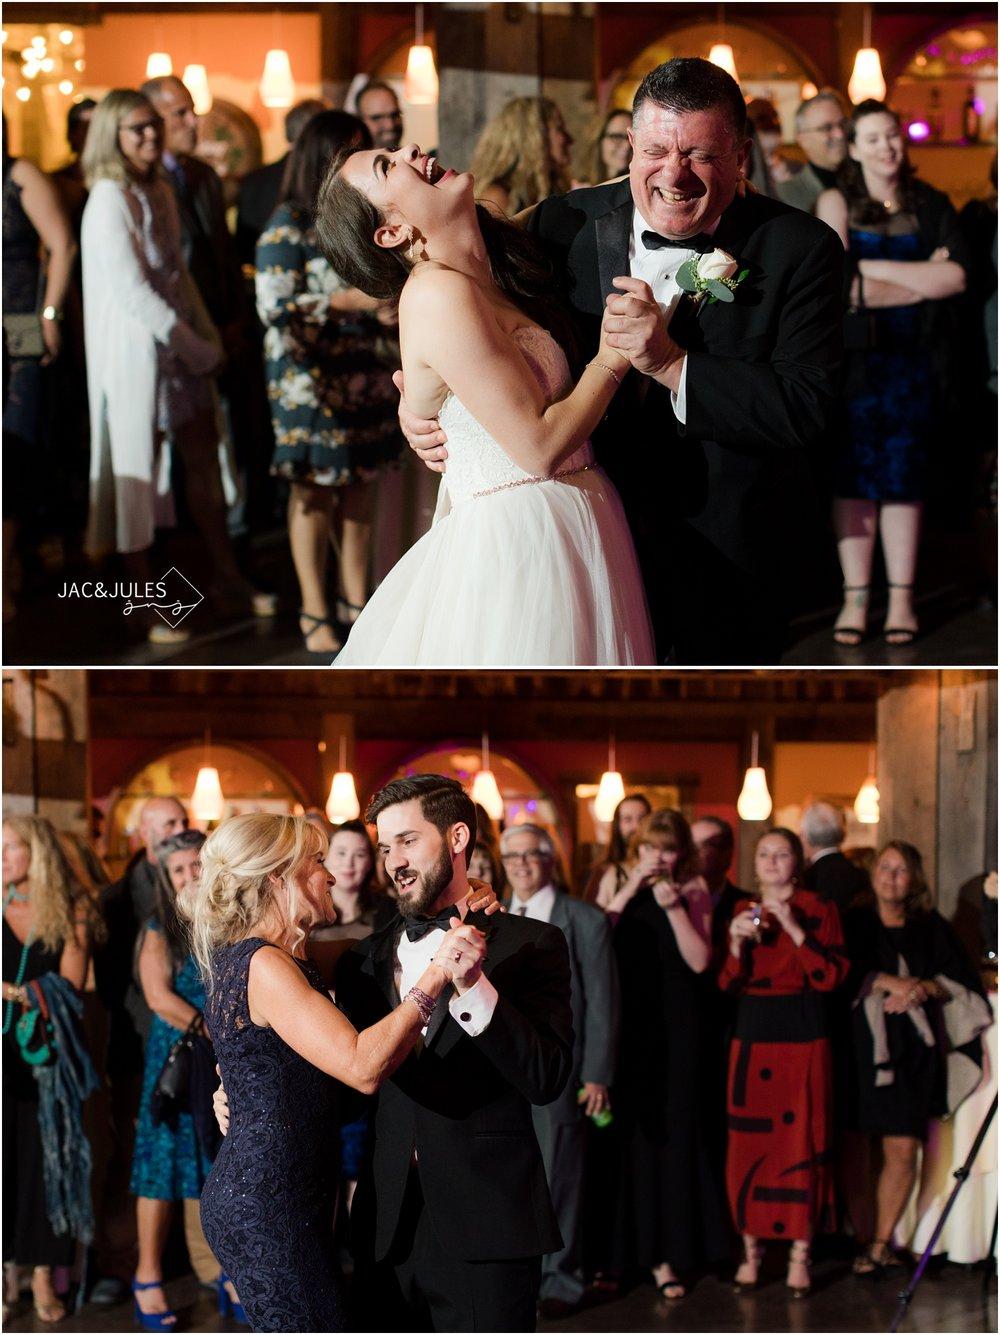 Parent Dances at wedding reception at Laurita Winery.